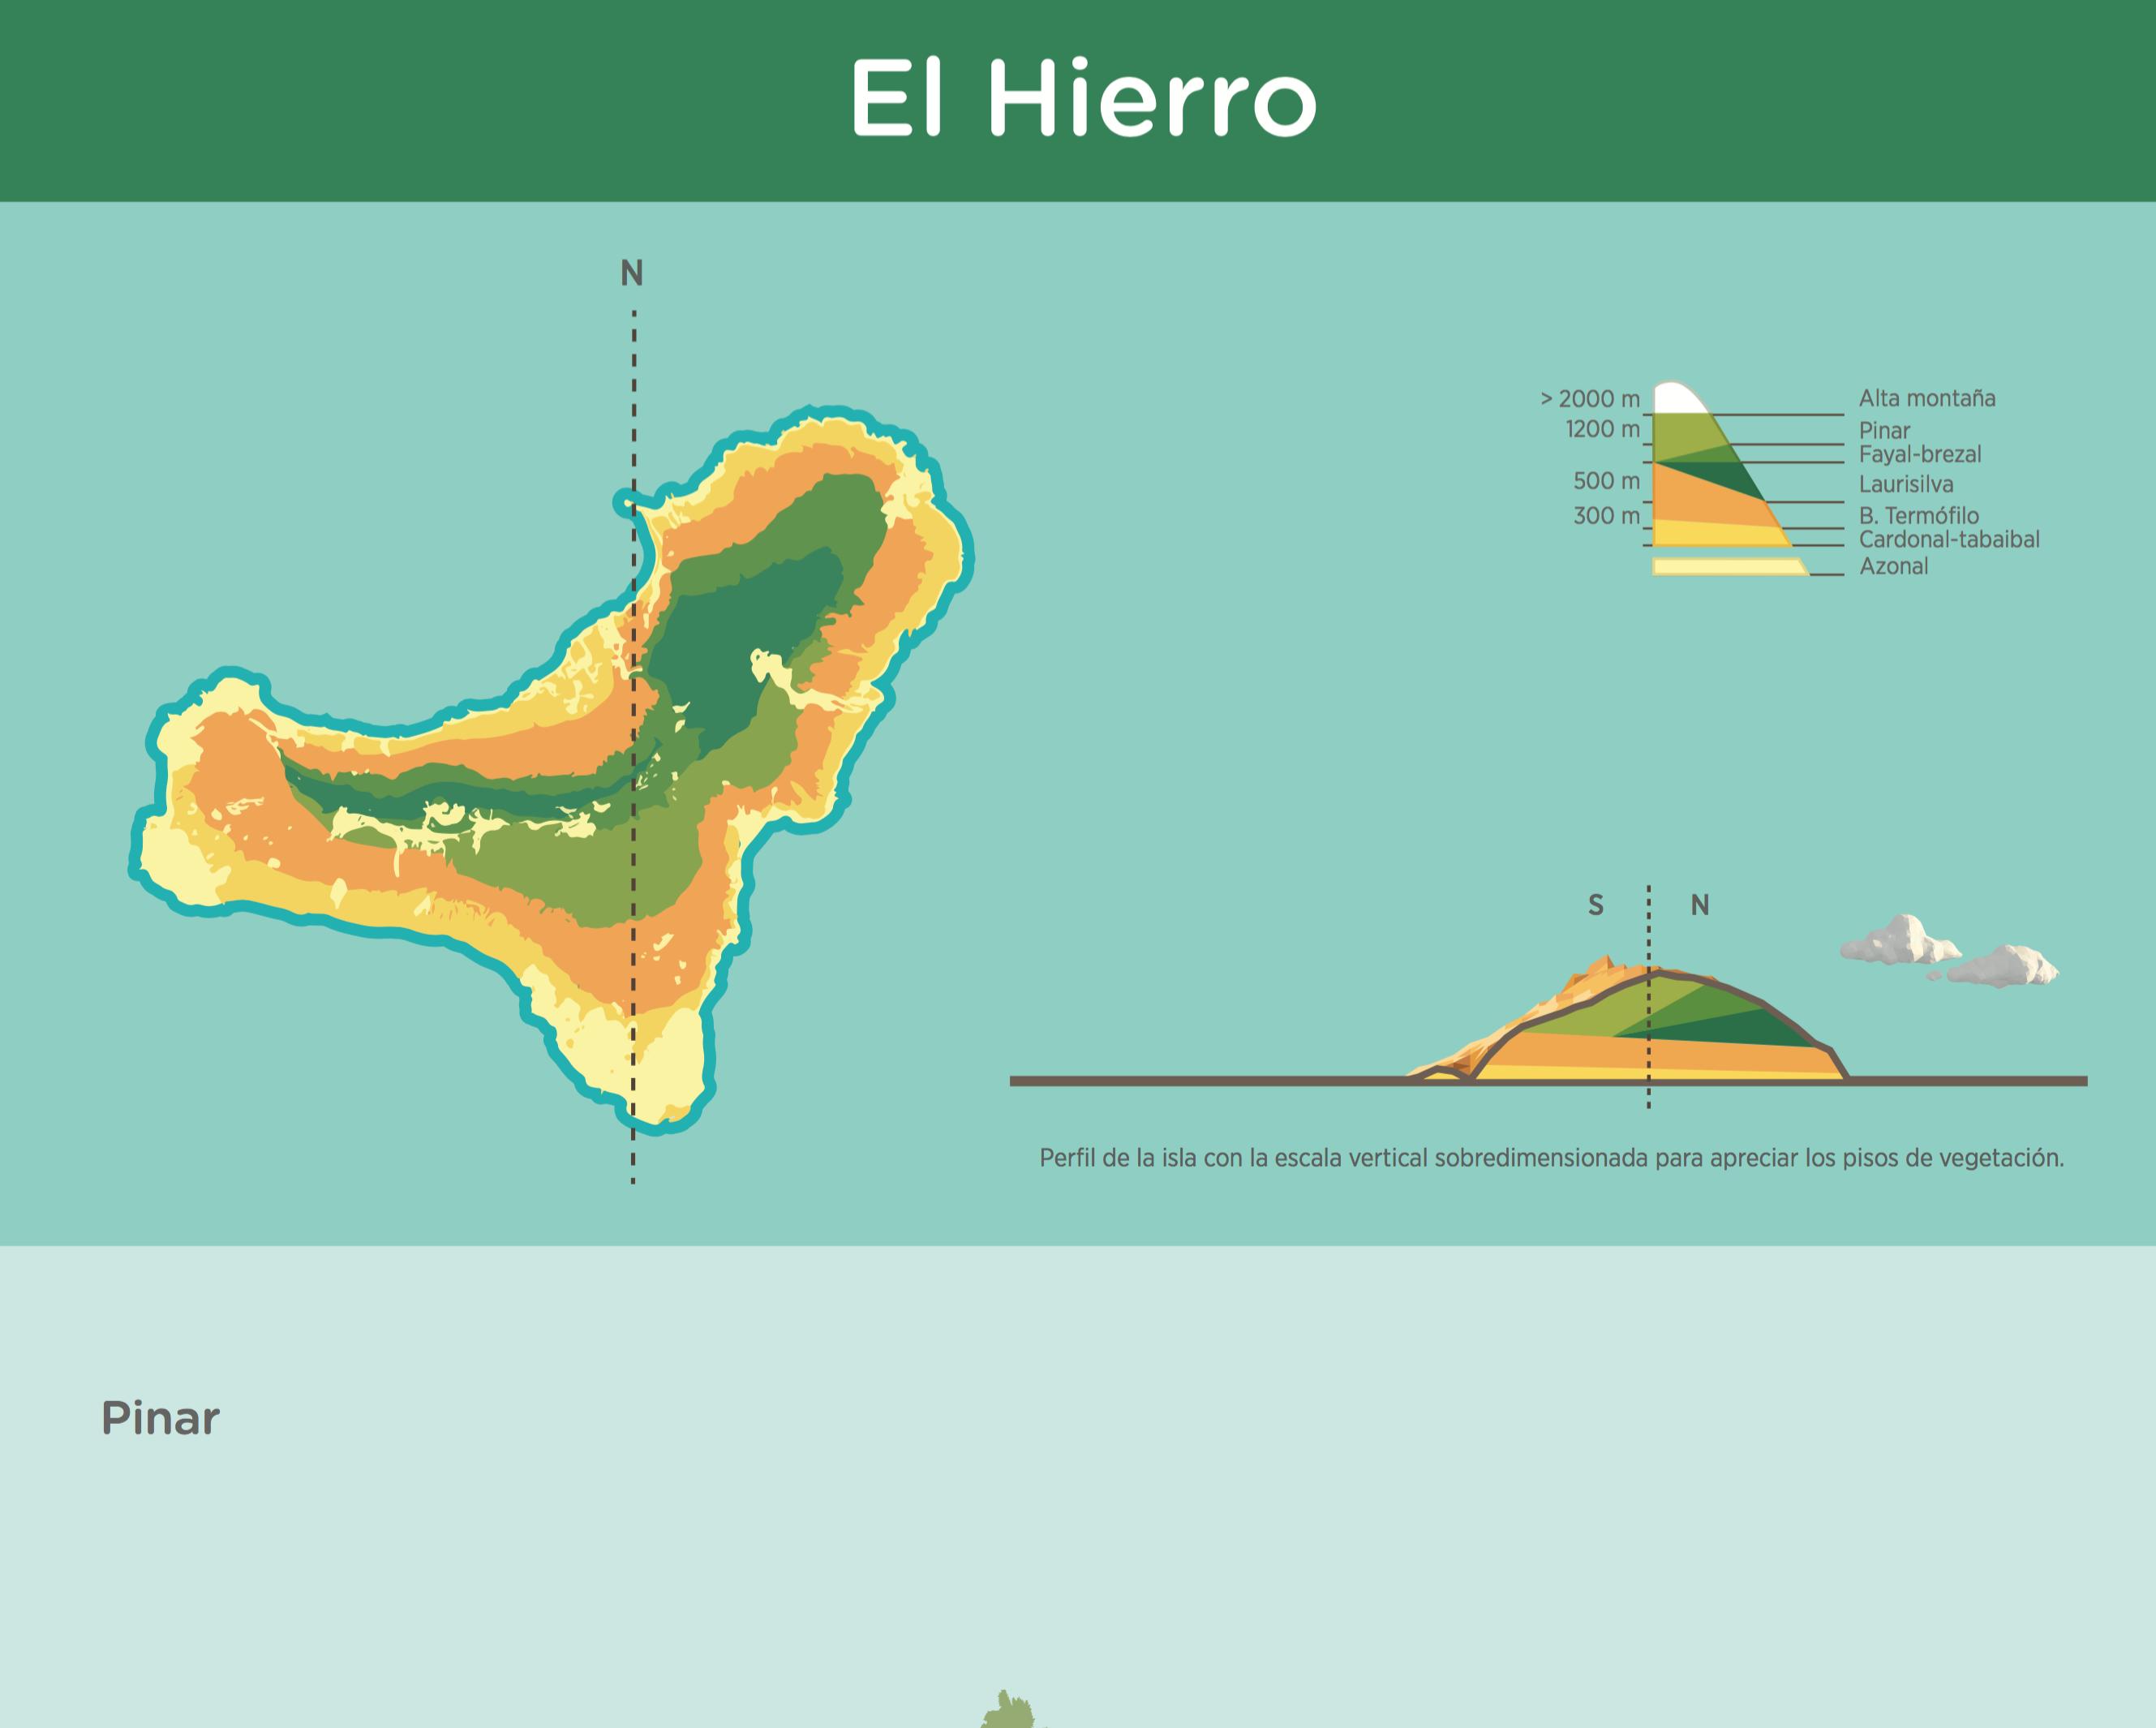 Infograf a pisos de vegetaci n de el hierro recursos for Pisos de vegetacion canarias